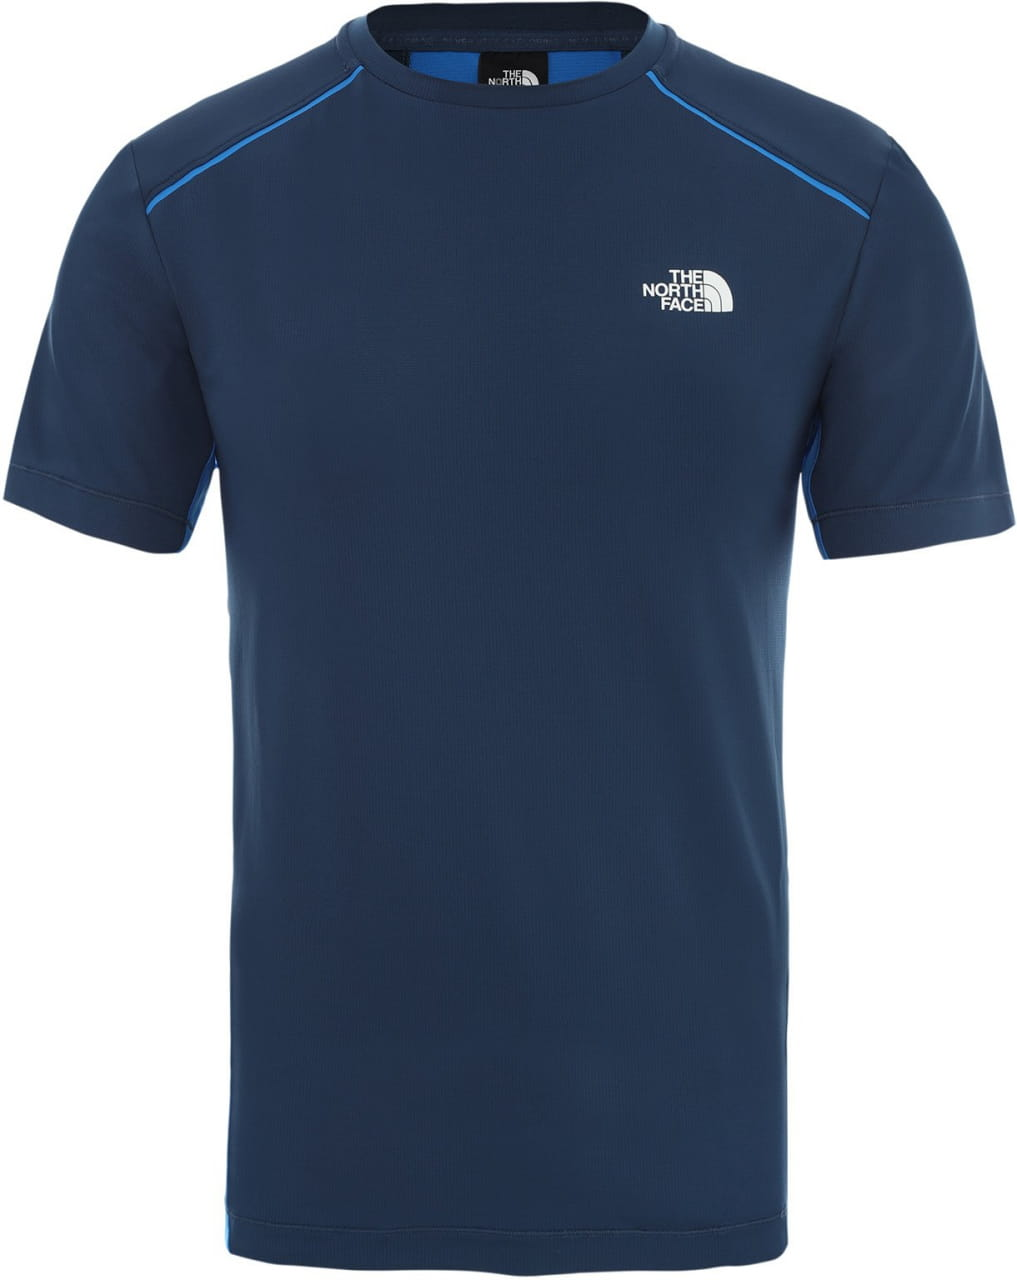 T-Shirts The North Face Men's Apex T-Shirt